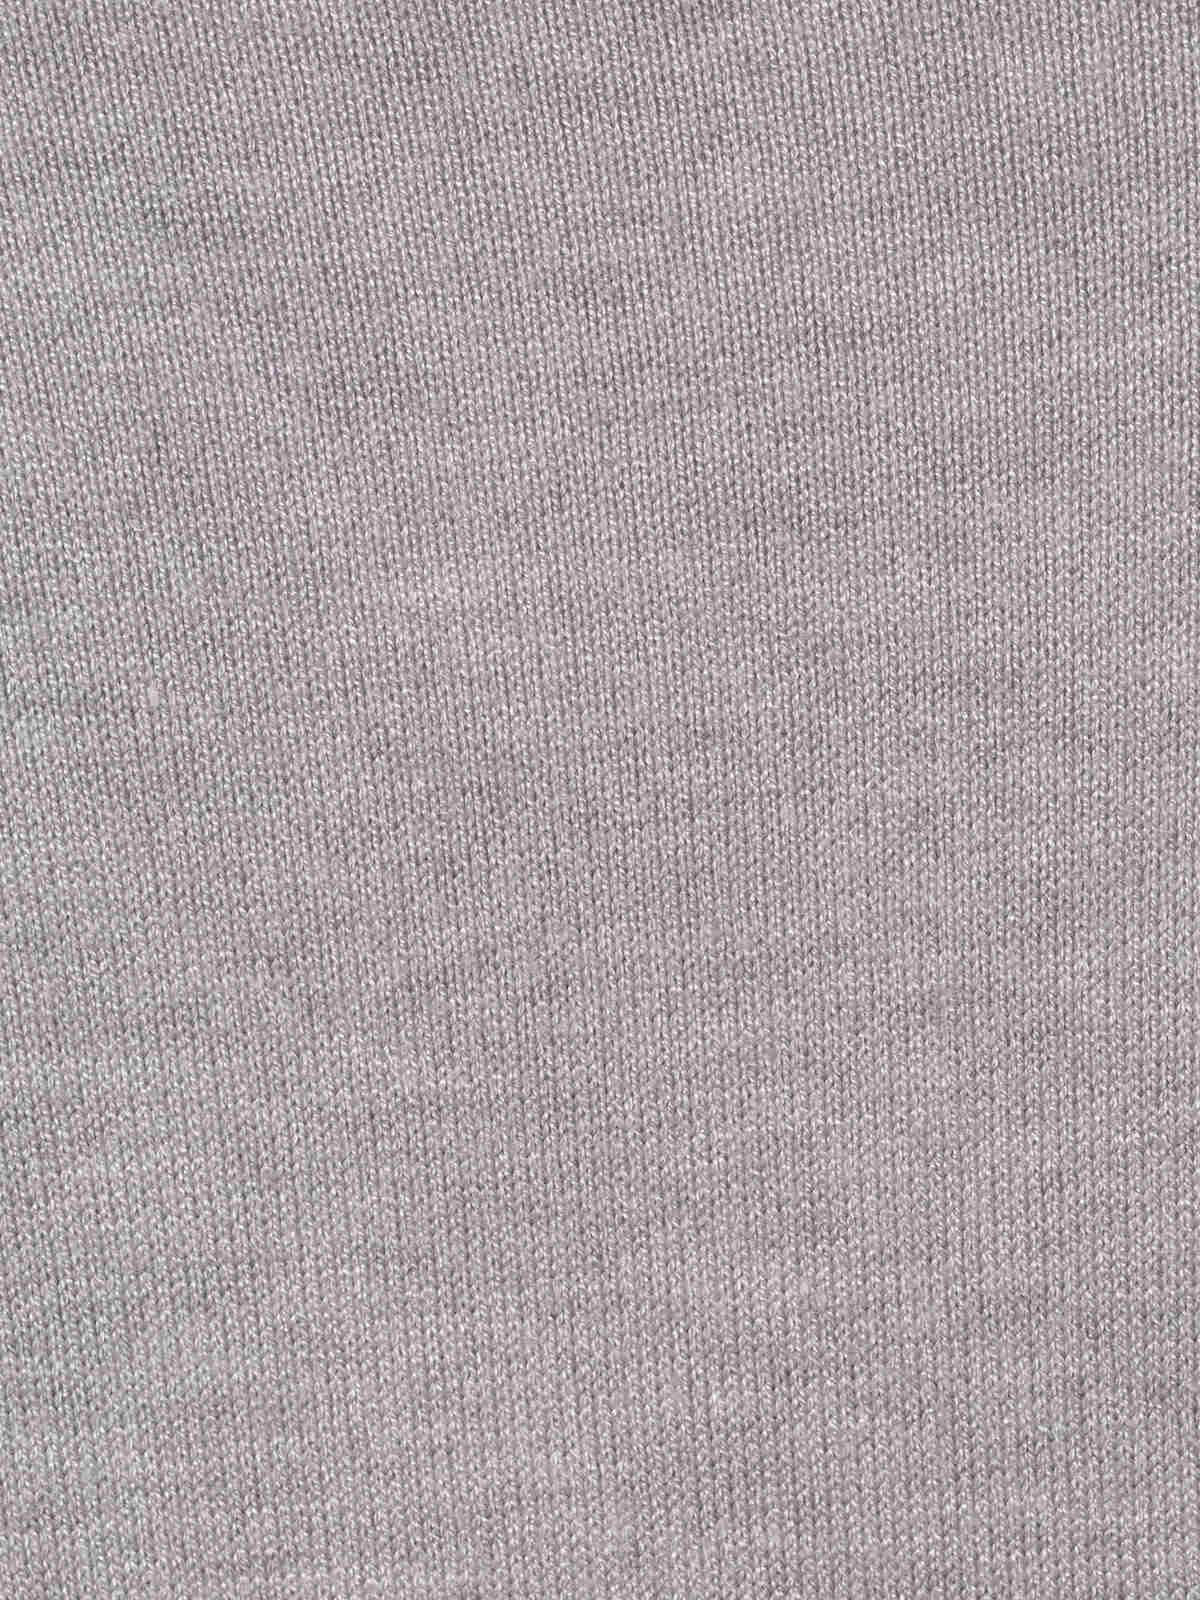 Camiseta mujer punto costuras Gris